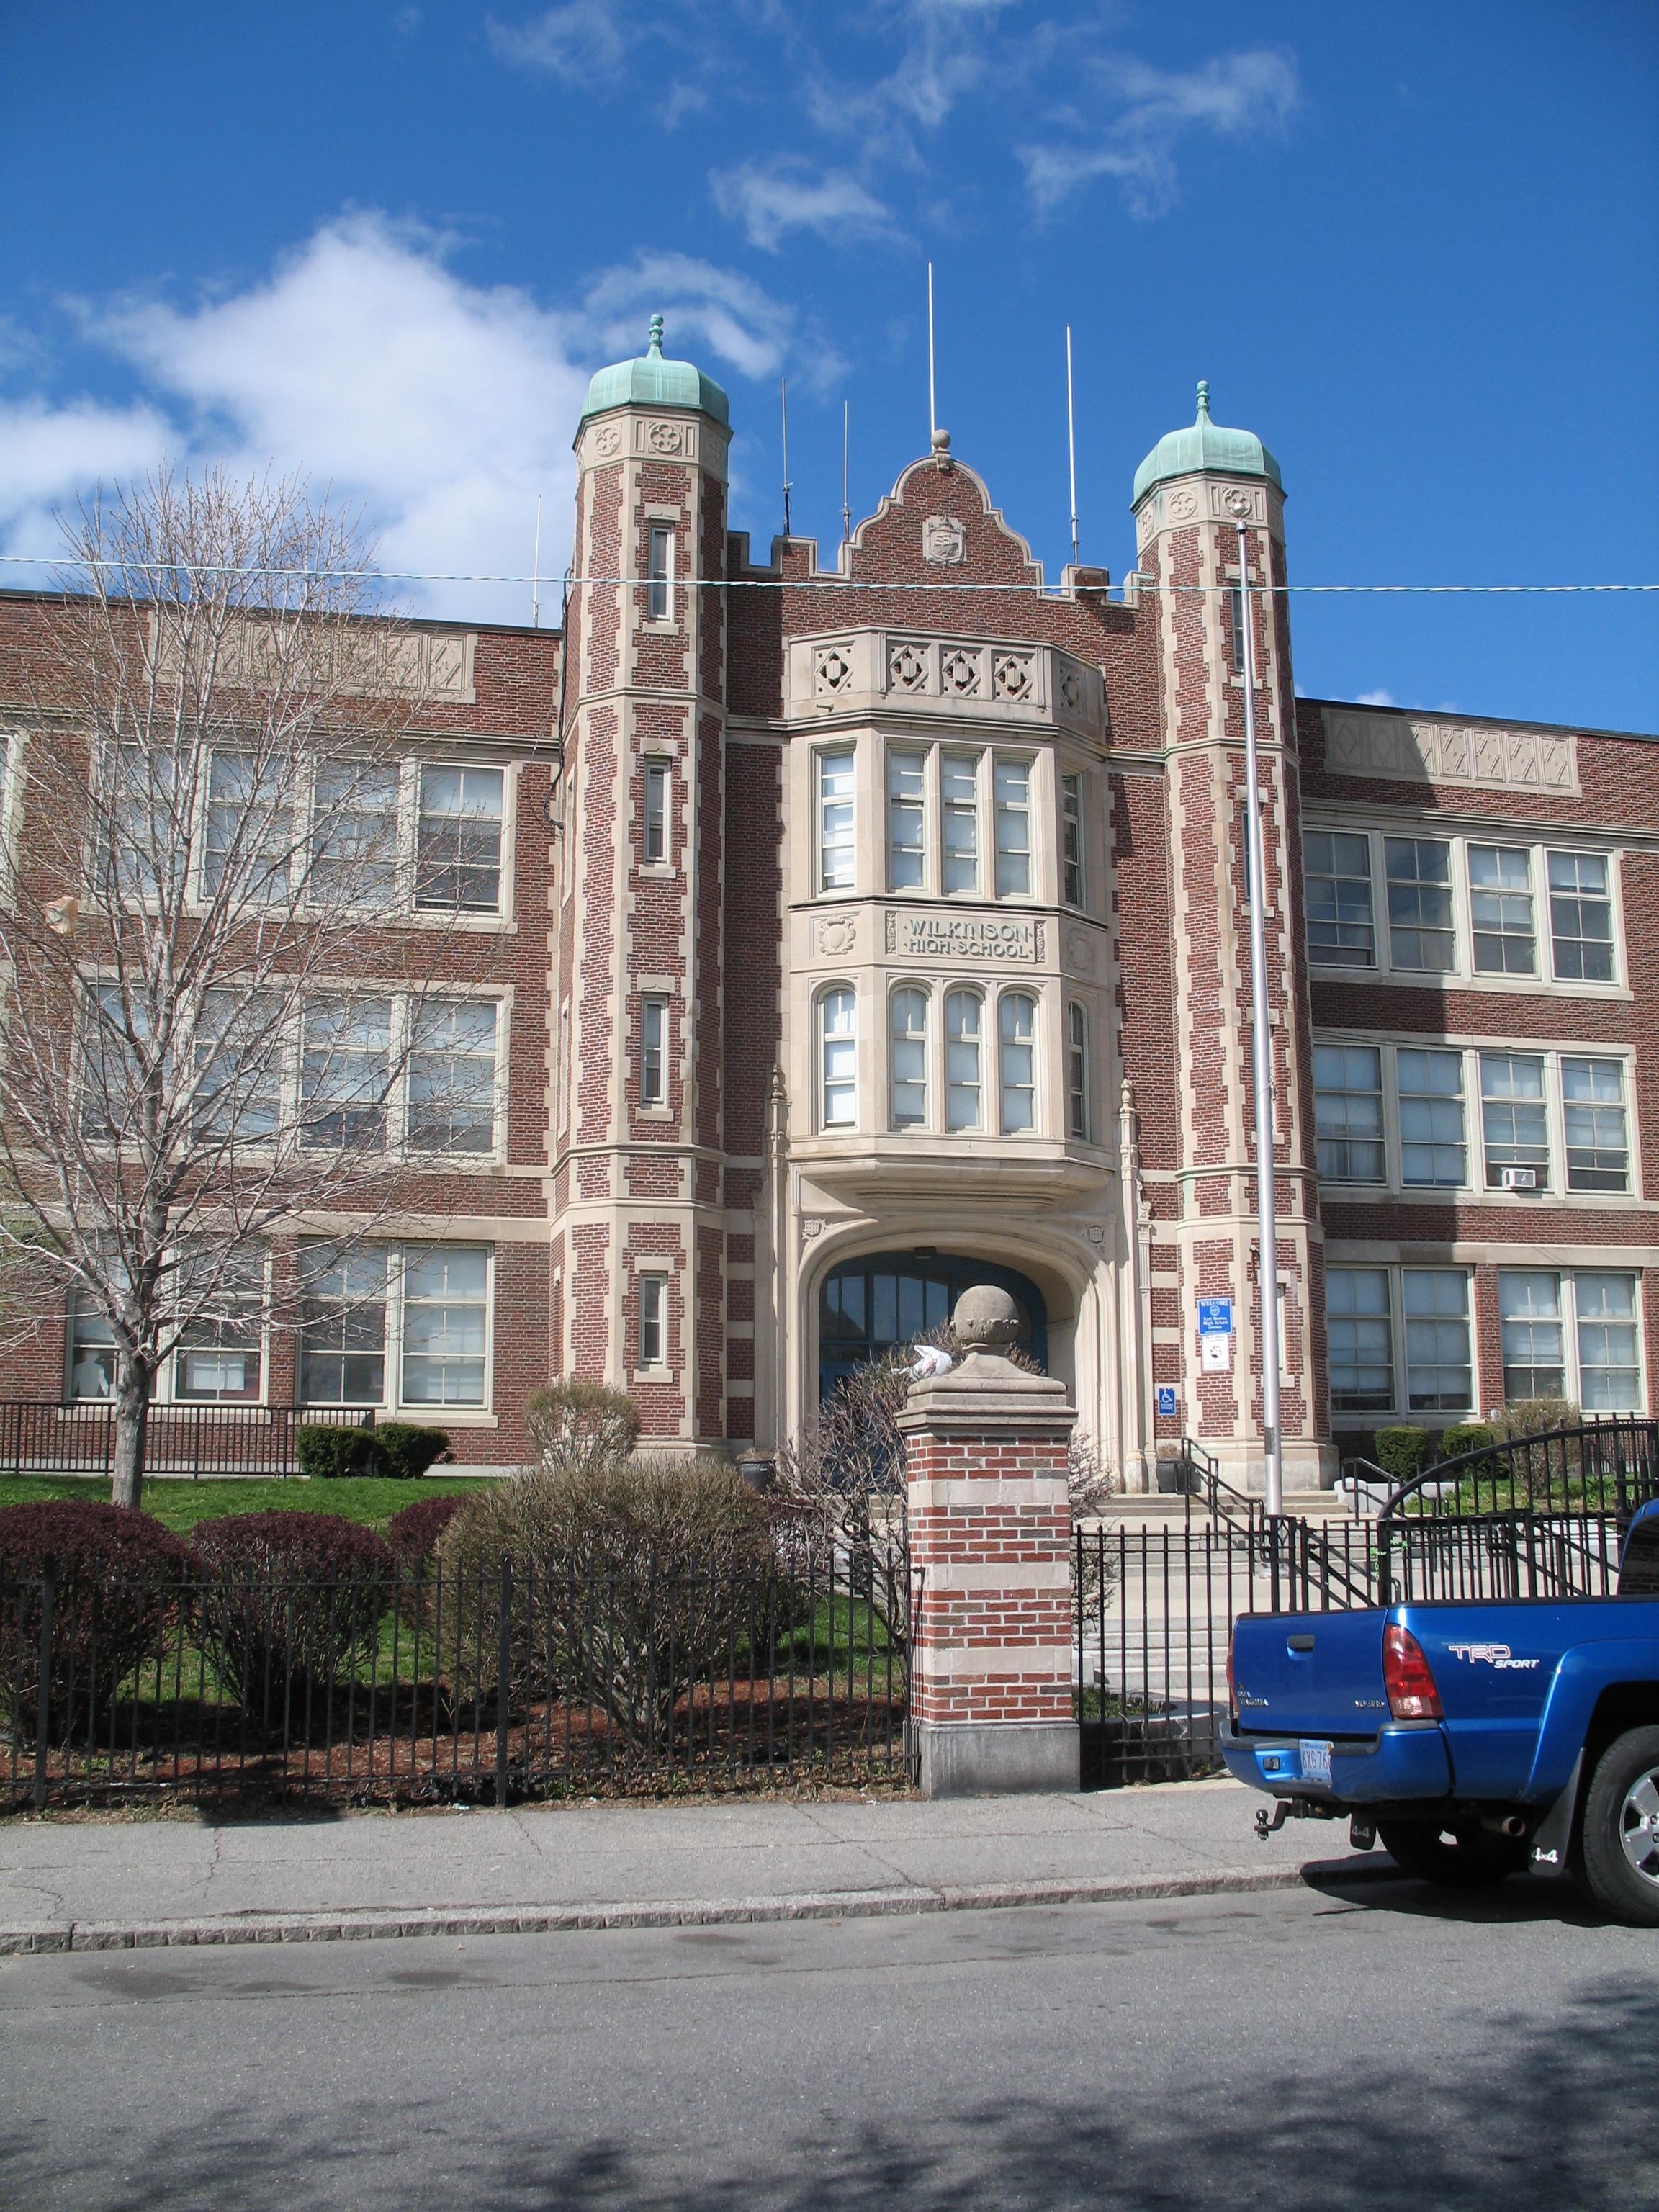 Boston Public Schools For Kids Who Need Help